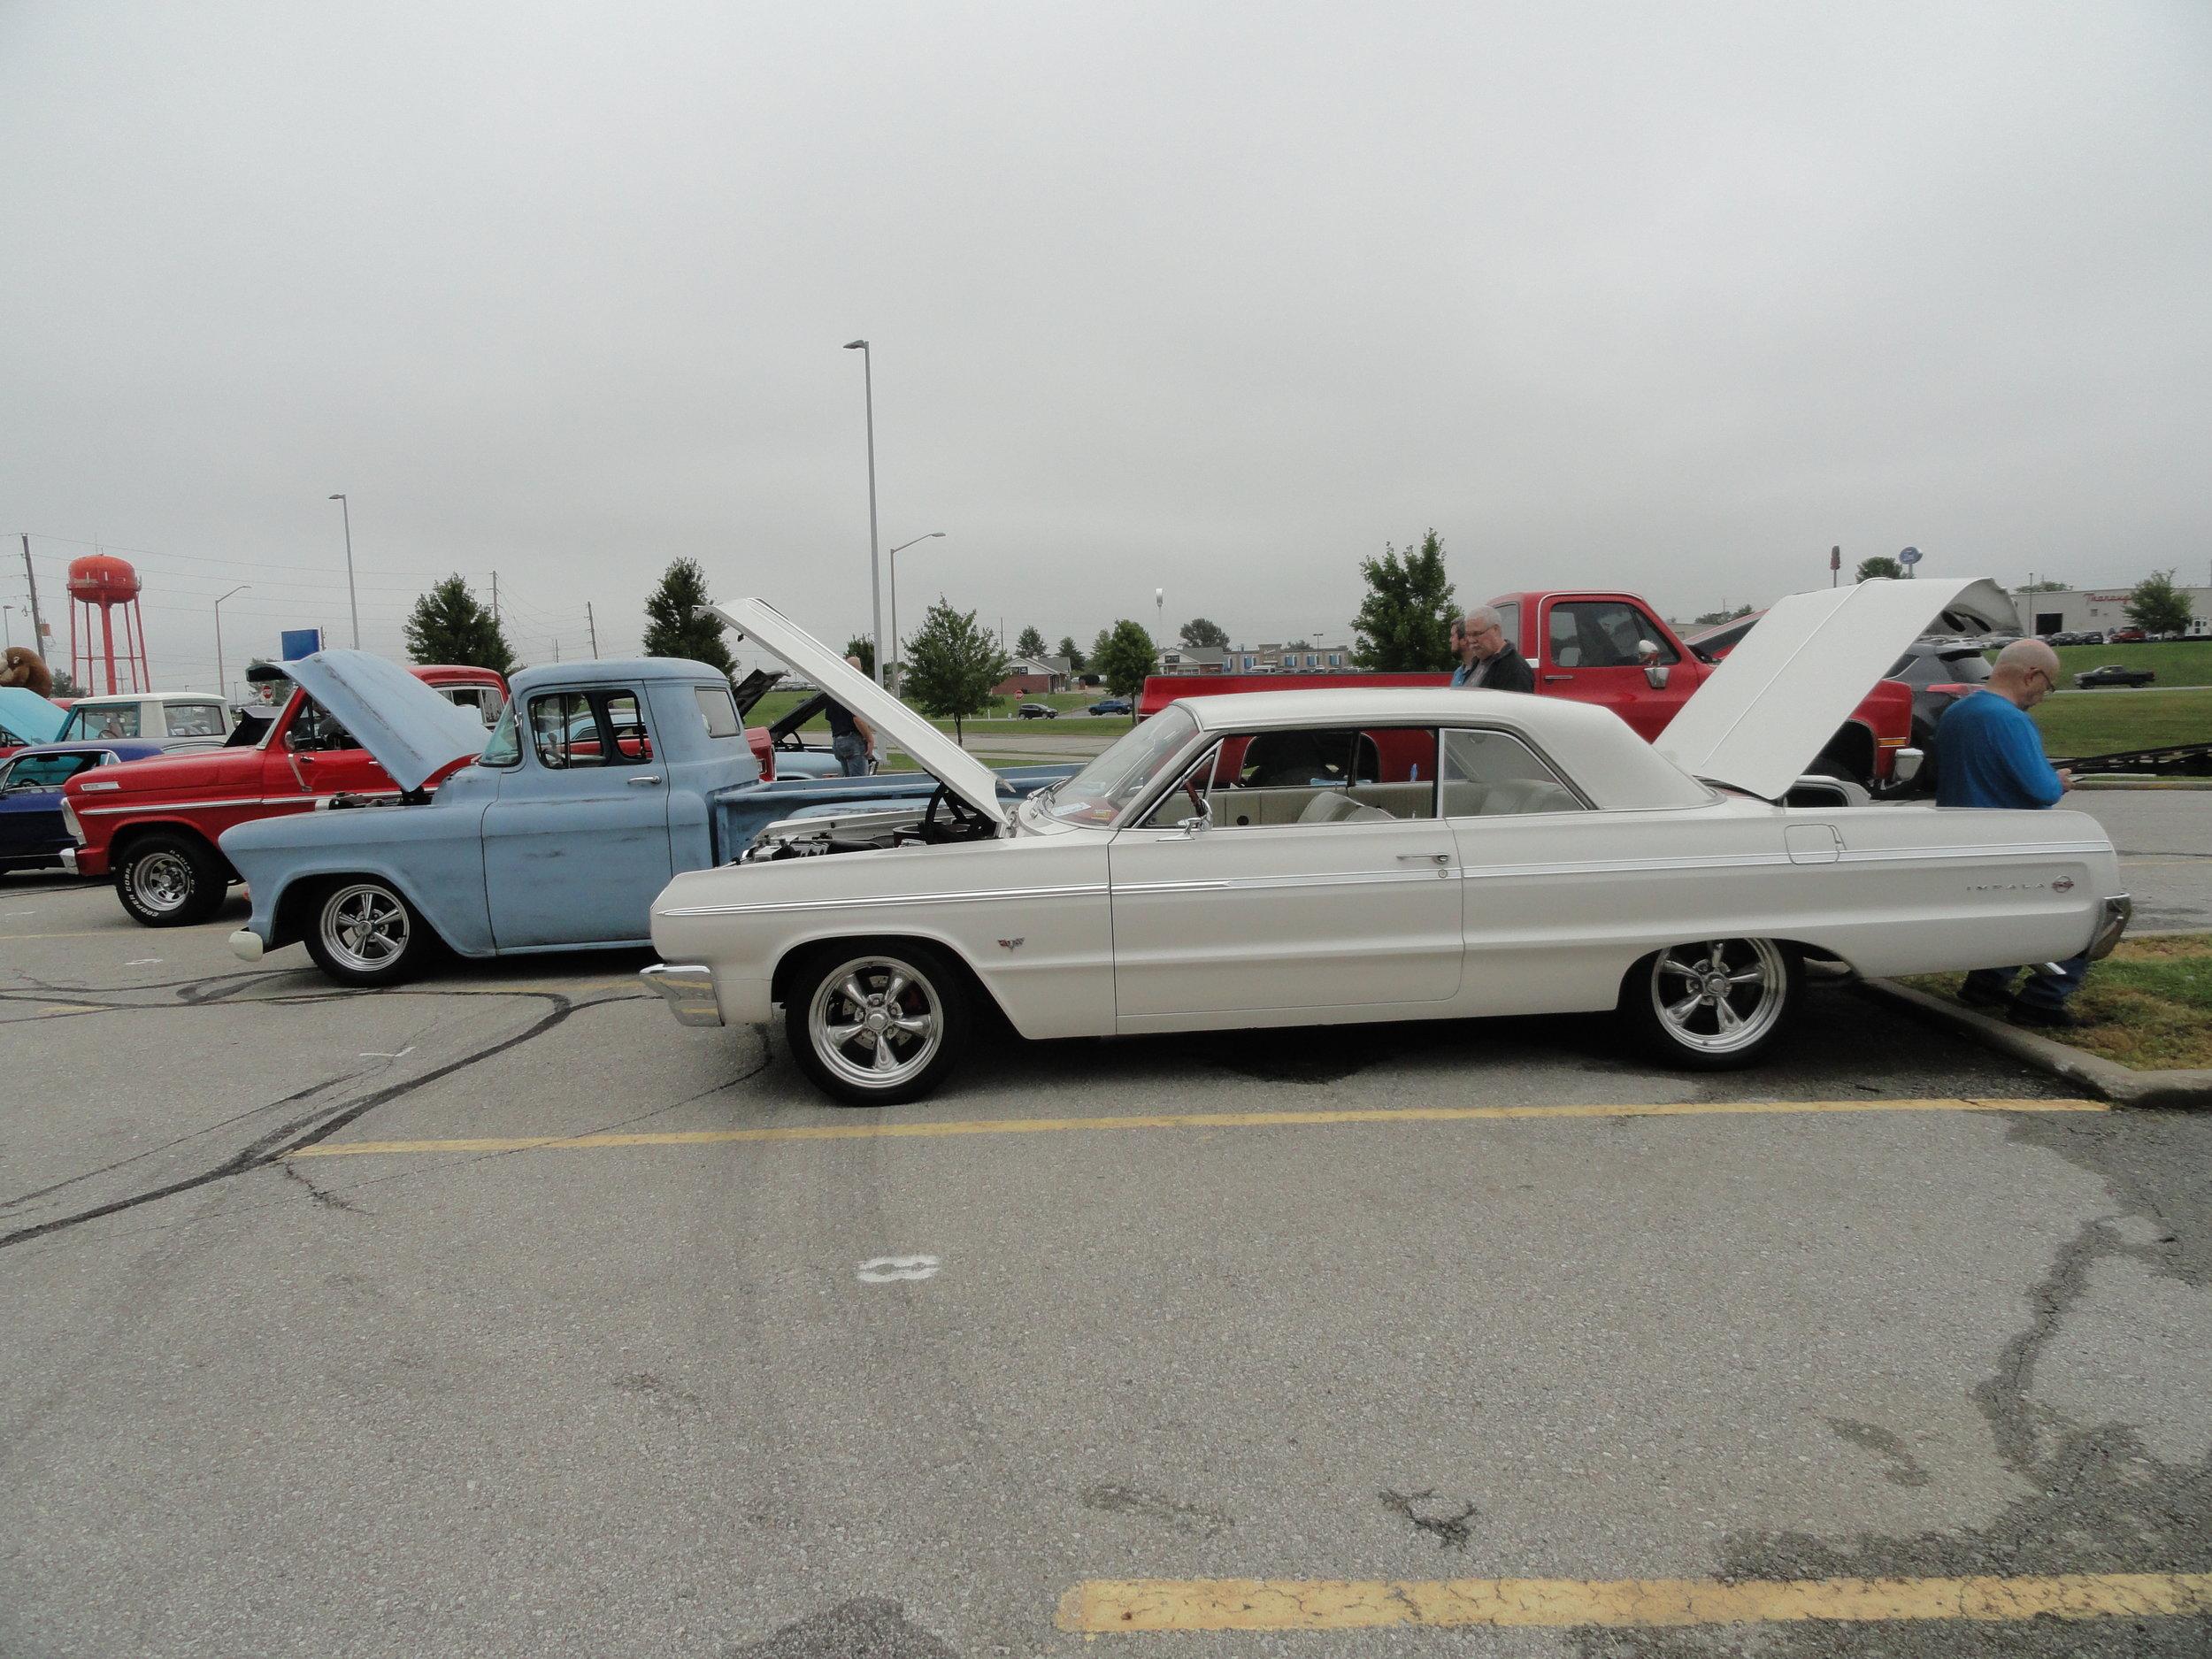 1964 Chevy Impala in show.JPG